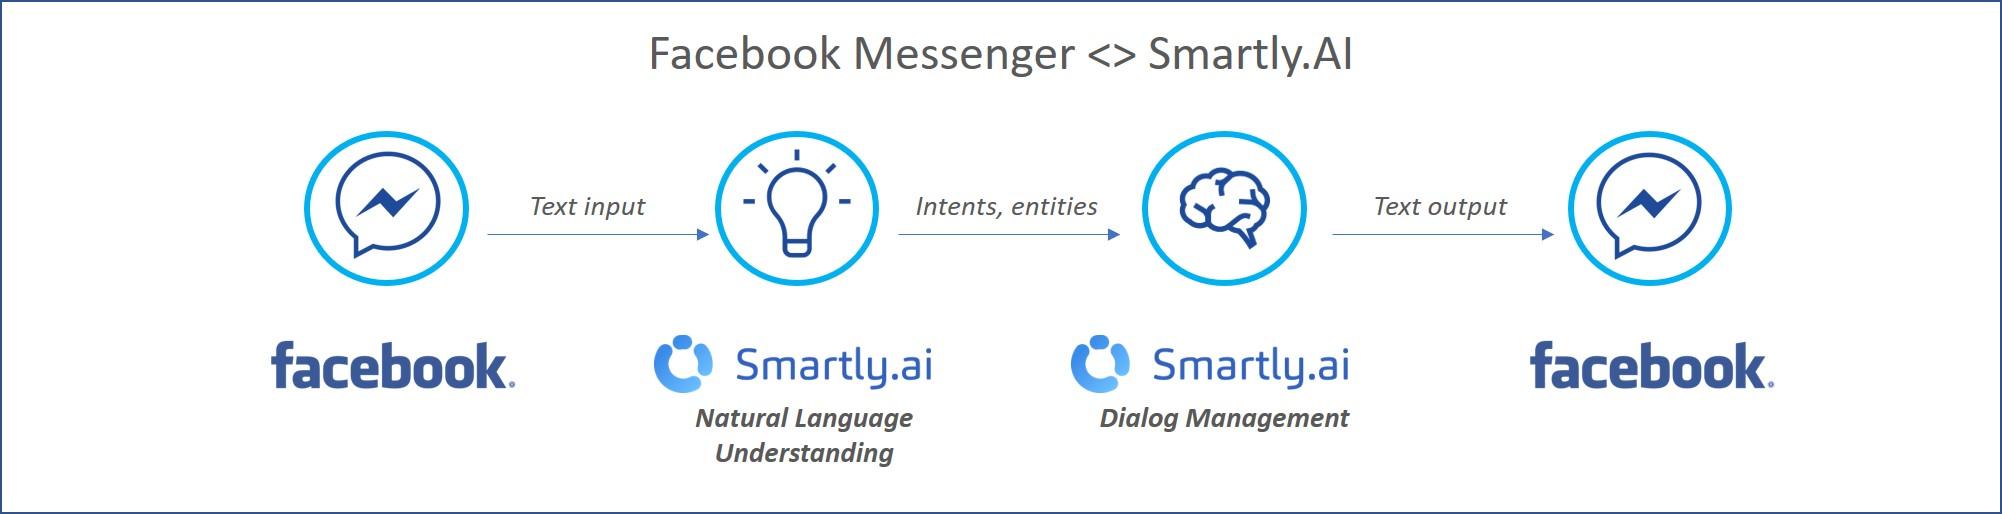 The Messenger integration